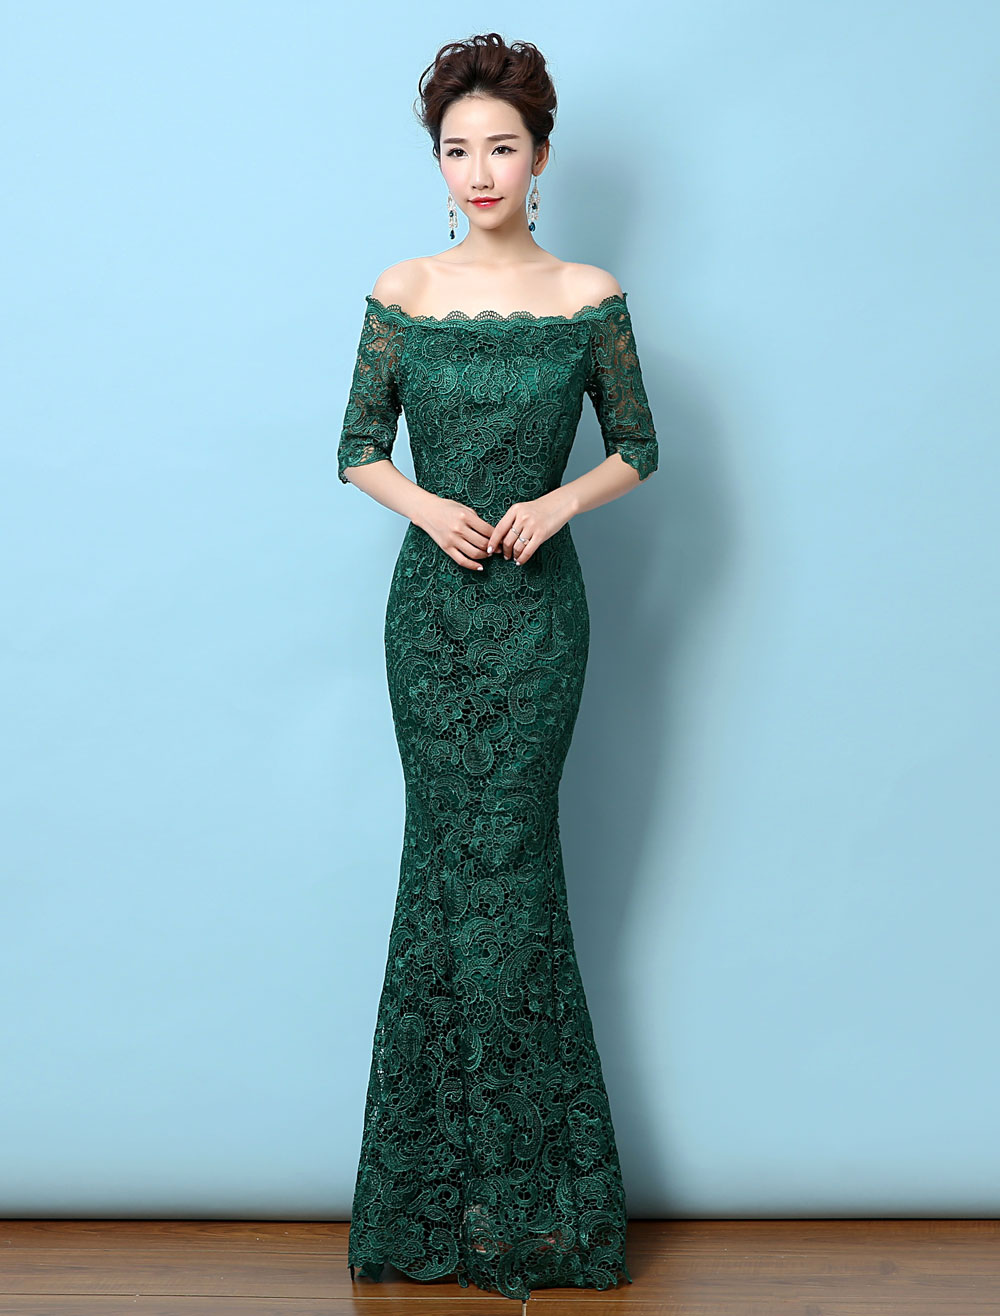 Lace Evening Dress Off The Shoulder Mermaid Party Dress Dark Green Half Sleeve Maxi Occasion Dress (Wedding Evening Dresses) photo